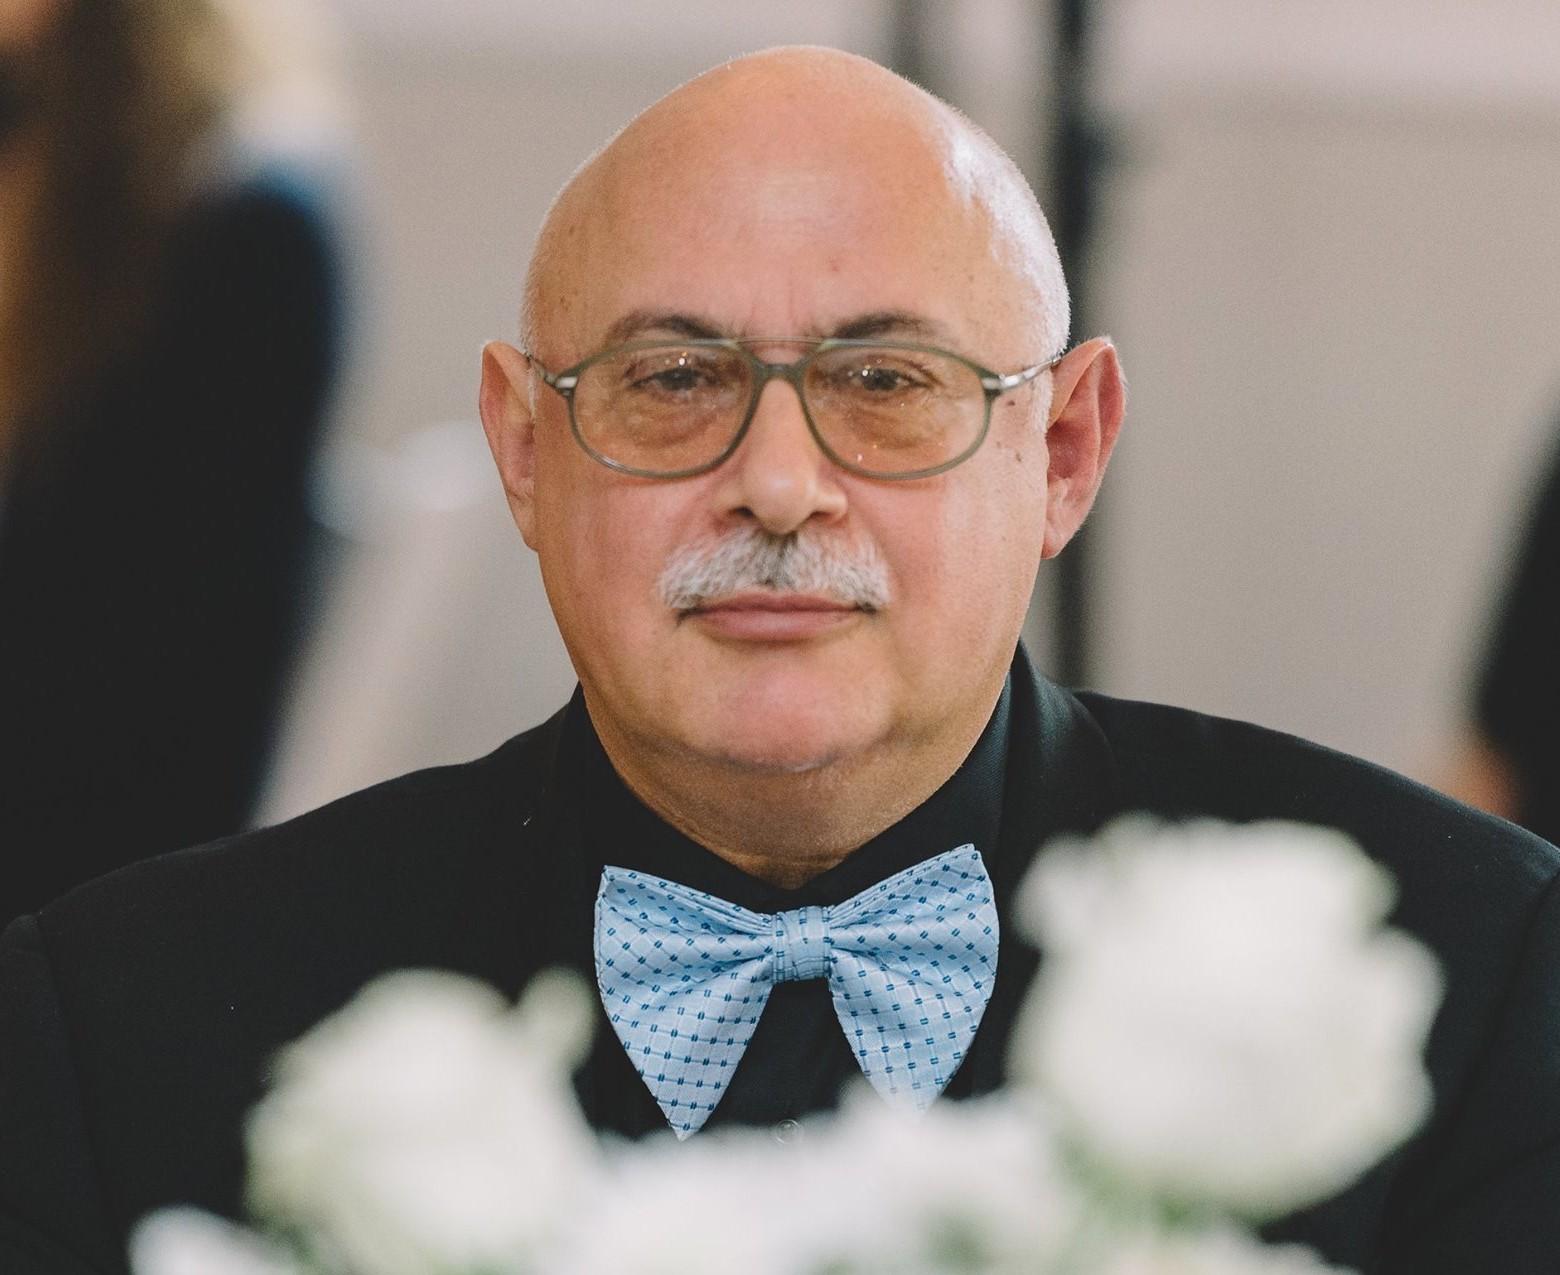 Youri L. Vater